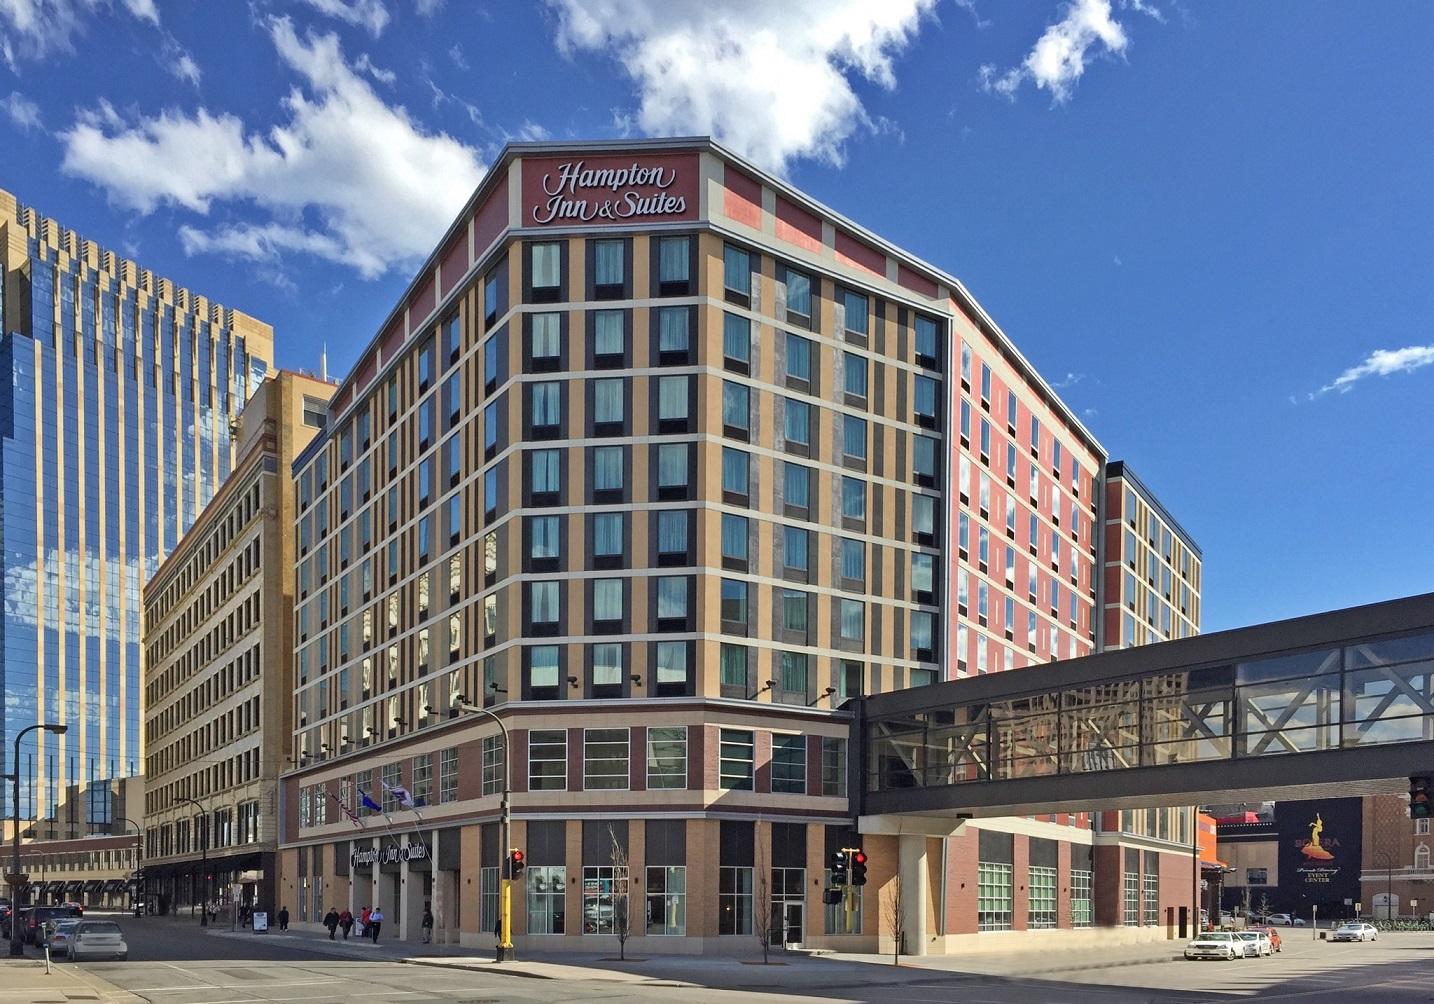 Hampton Inn & Suites in Minneapolis